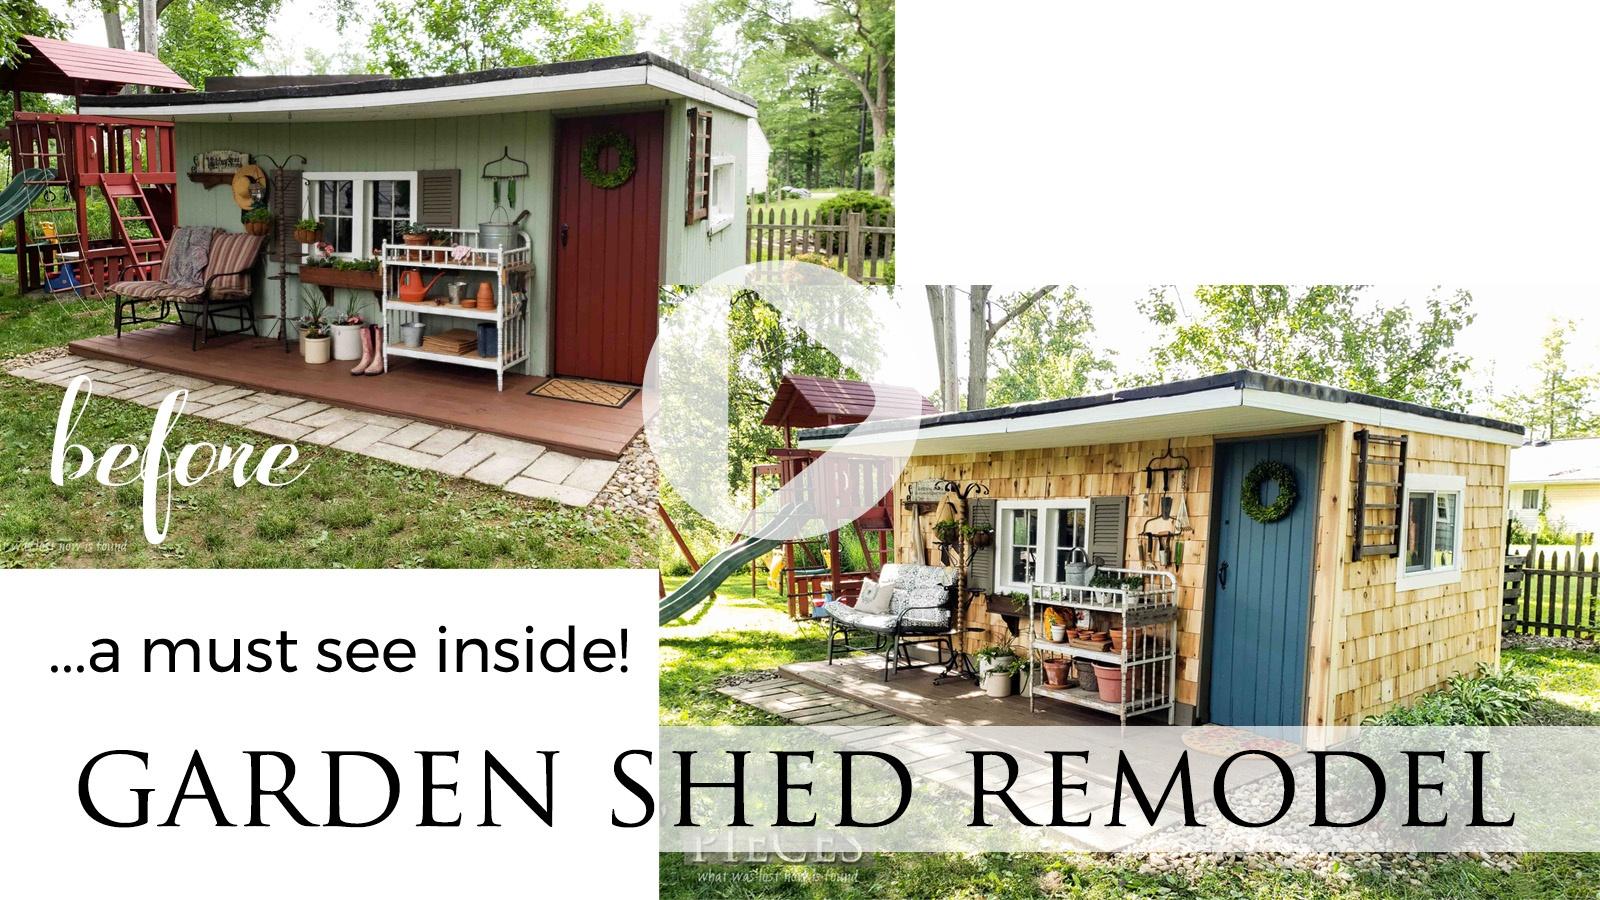 DIY Garden Shed Remodel Reveal Video Tour by Larissa of Prodigal Pieces | prodigalpieces.com #prodigal #diy #garden #home #homedecor